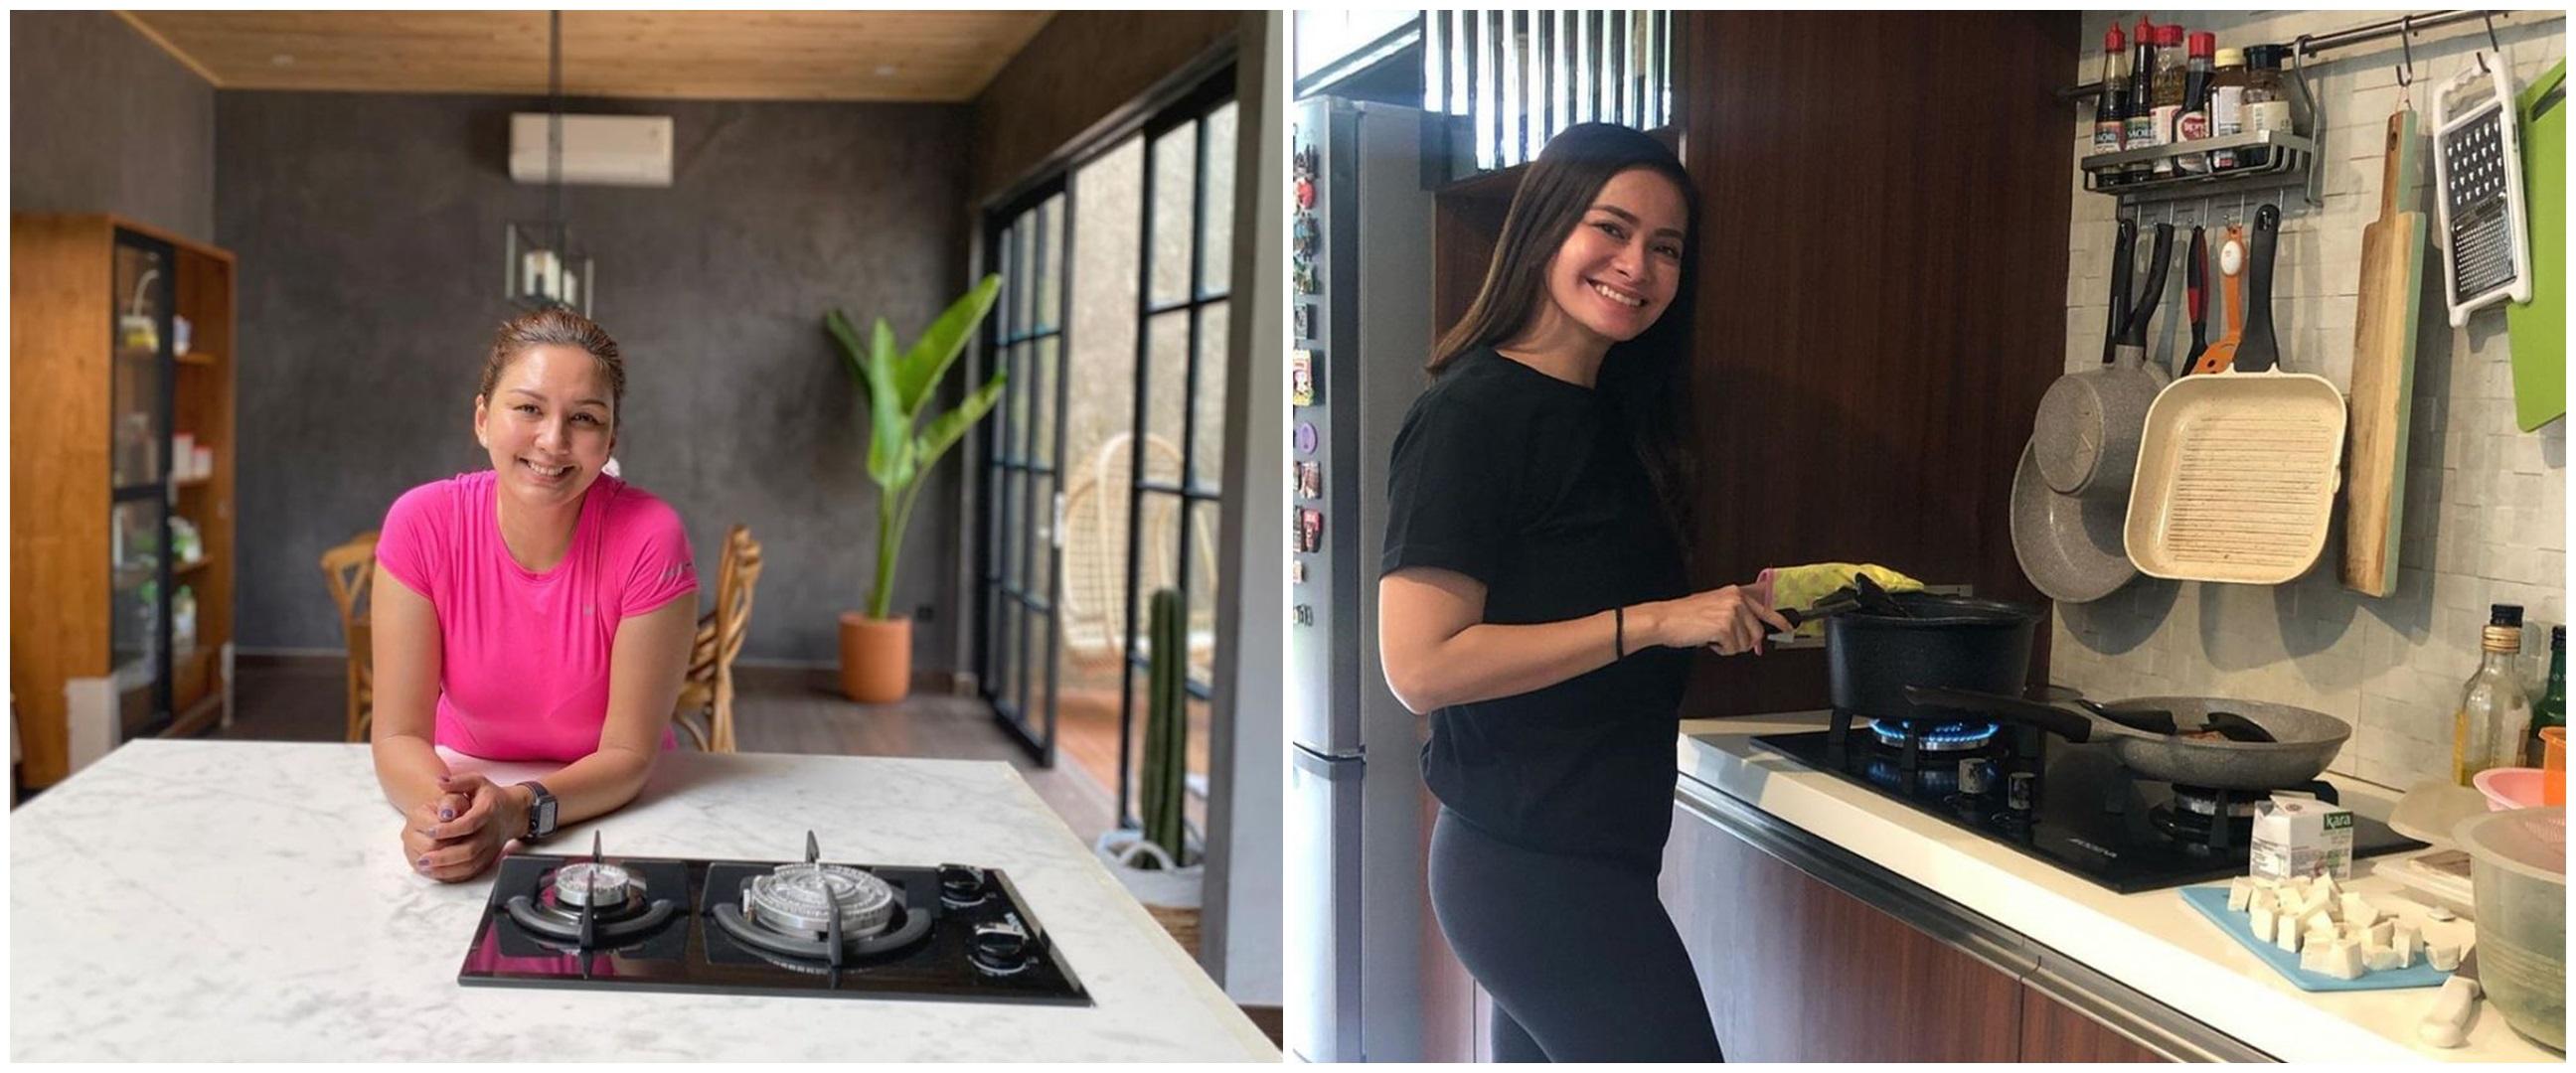 Potret dapur 10 presenter cantik, mewah hingga gaya industrial